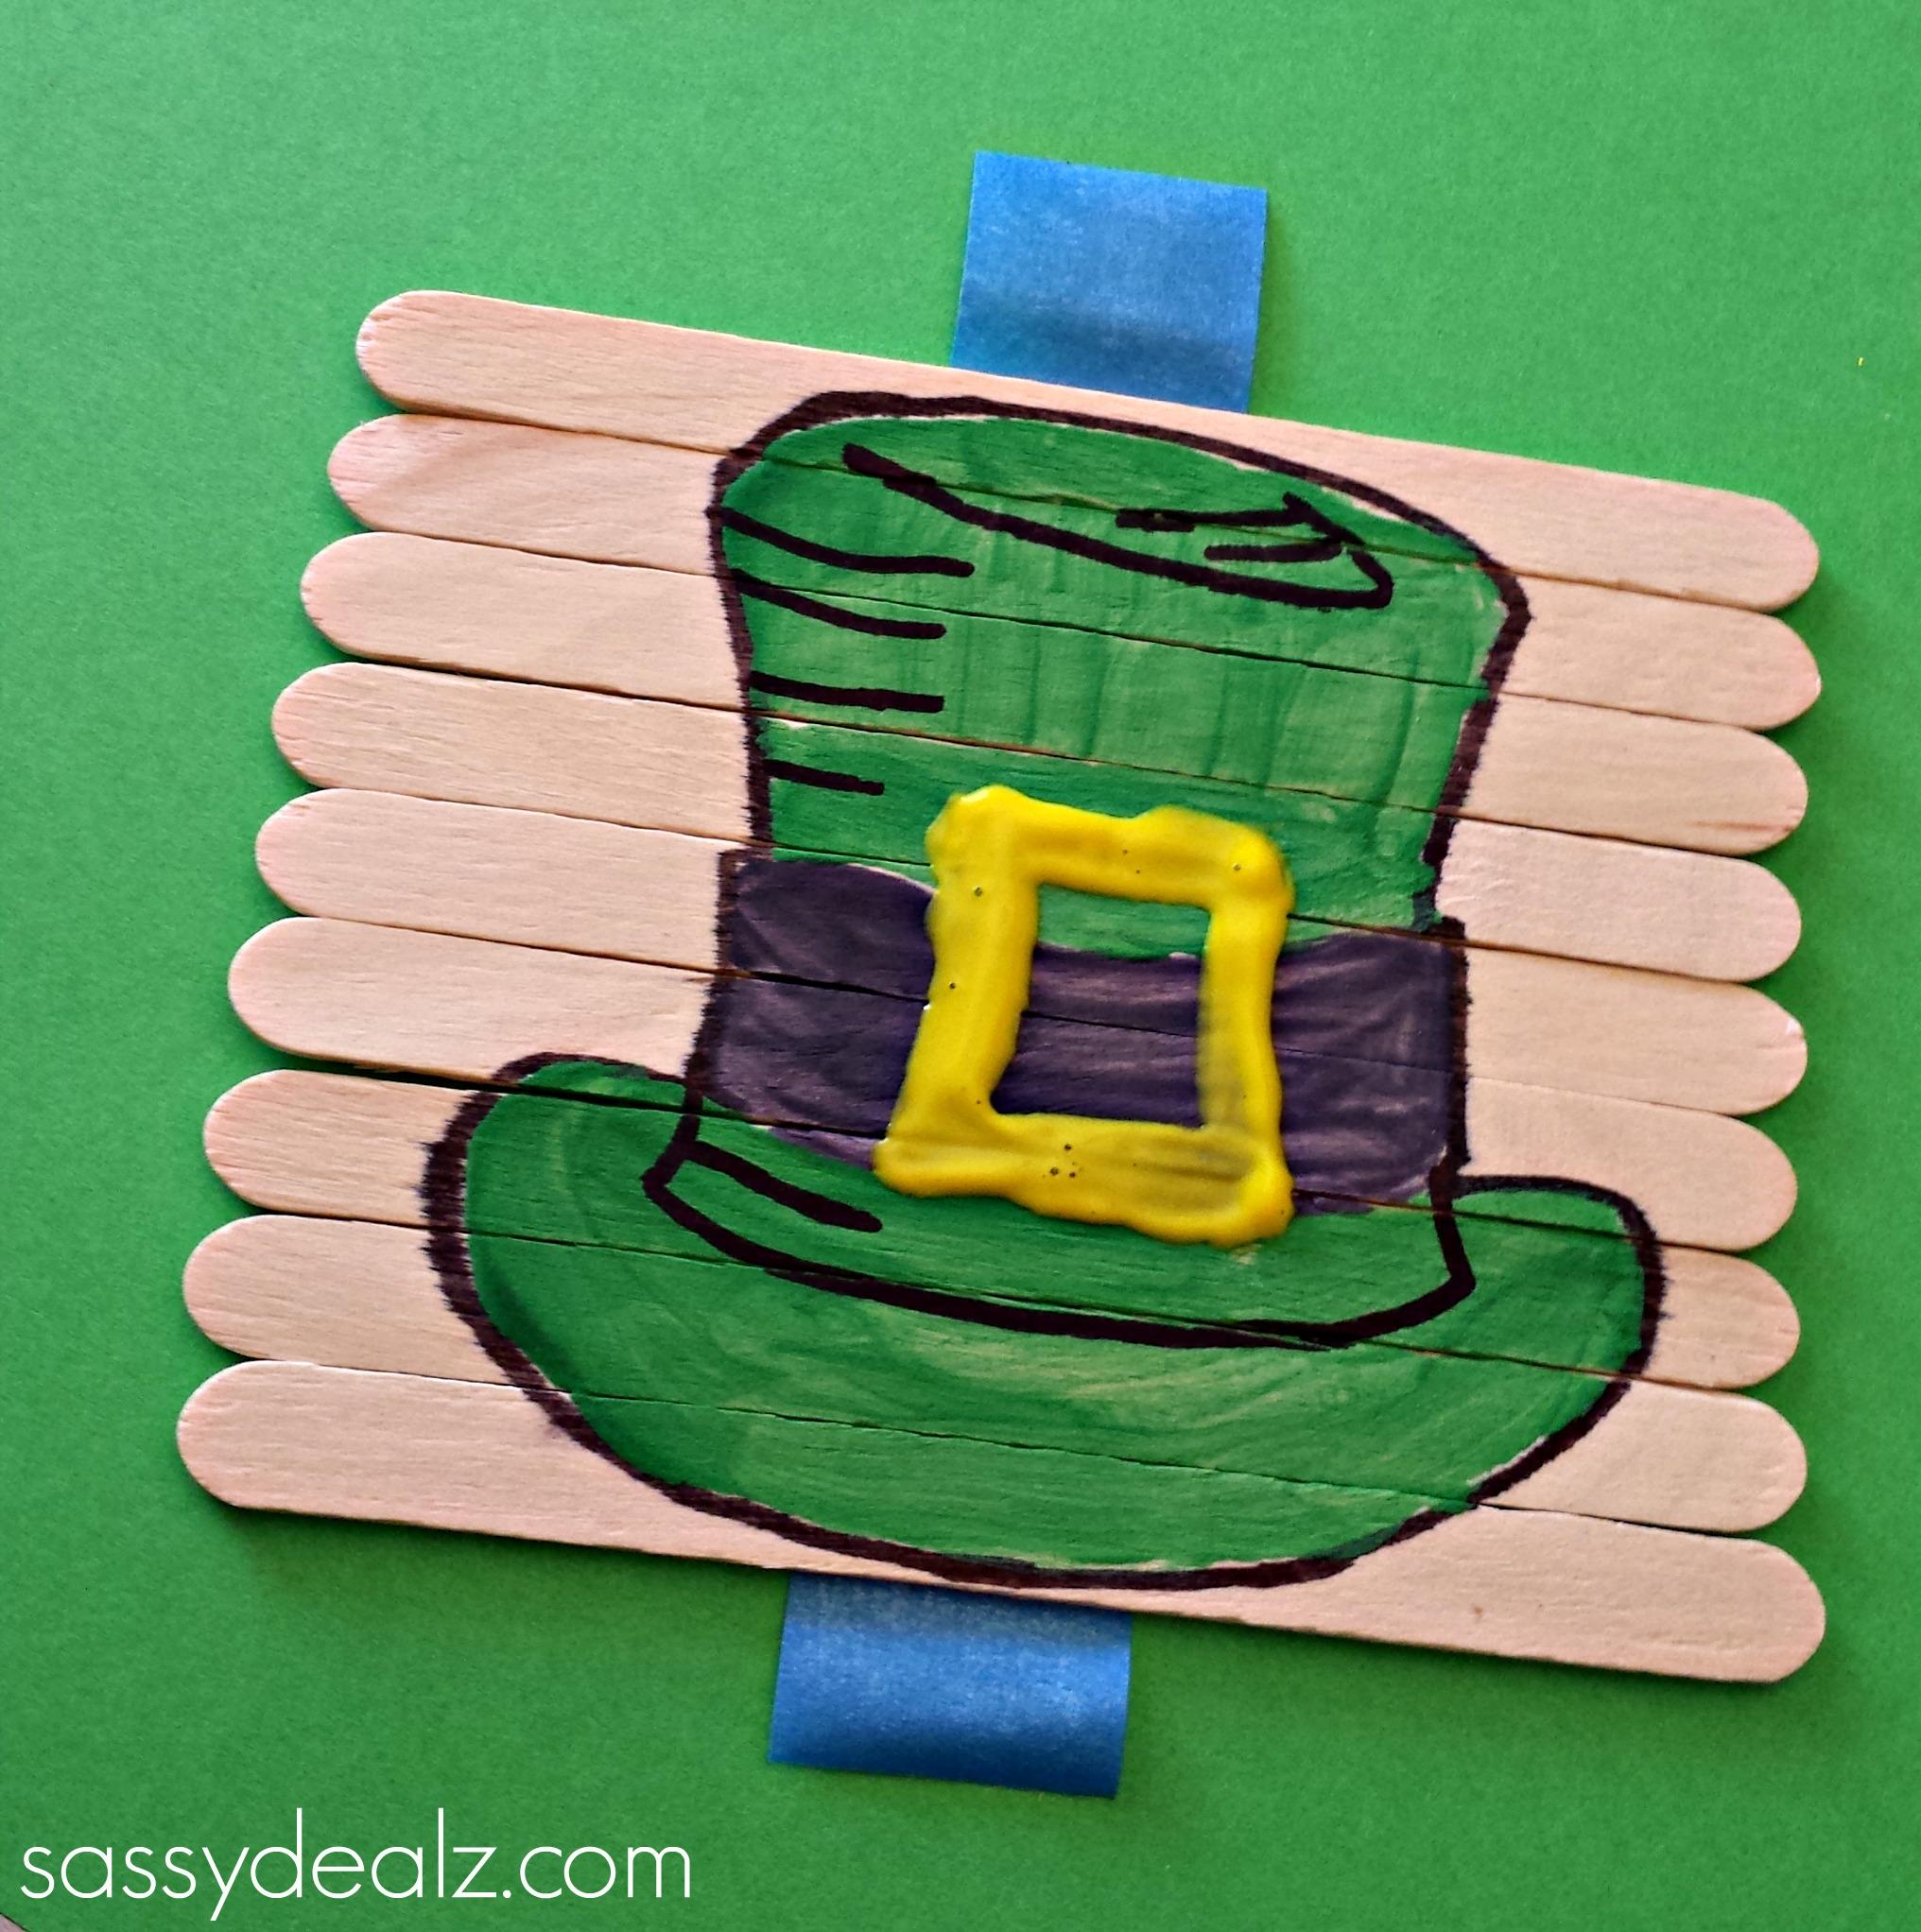 Crafts for st patricks day - St Patricks Day Popsicle Stick Puzzle Craft Shamrock Popsicle Stick Puzzle Craft